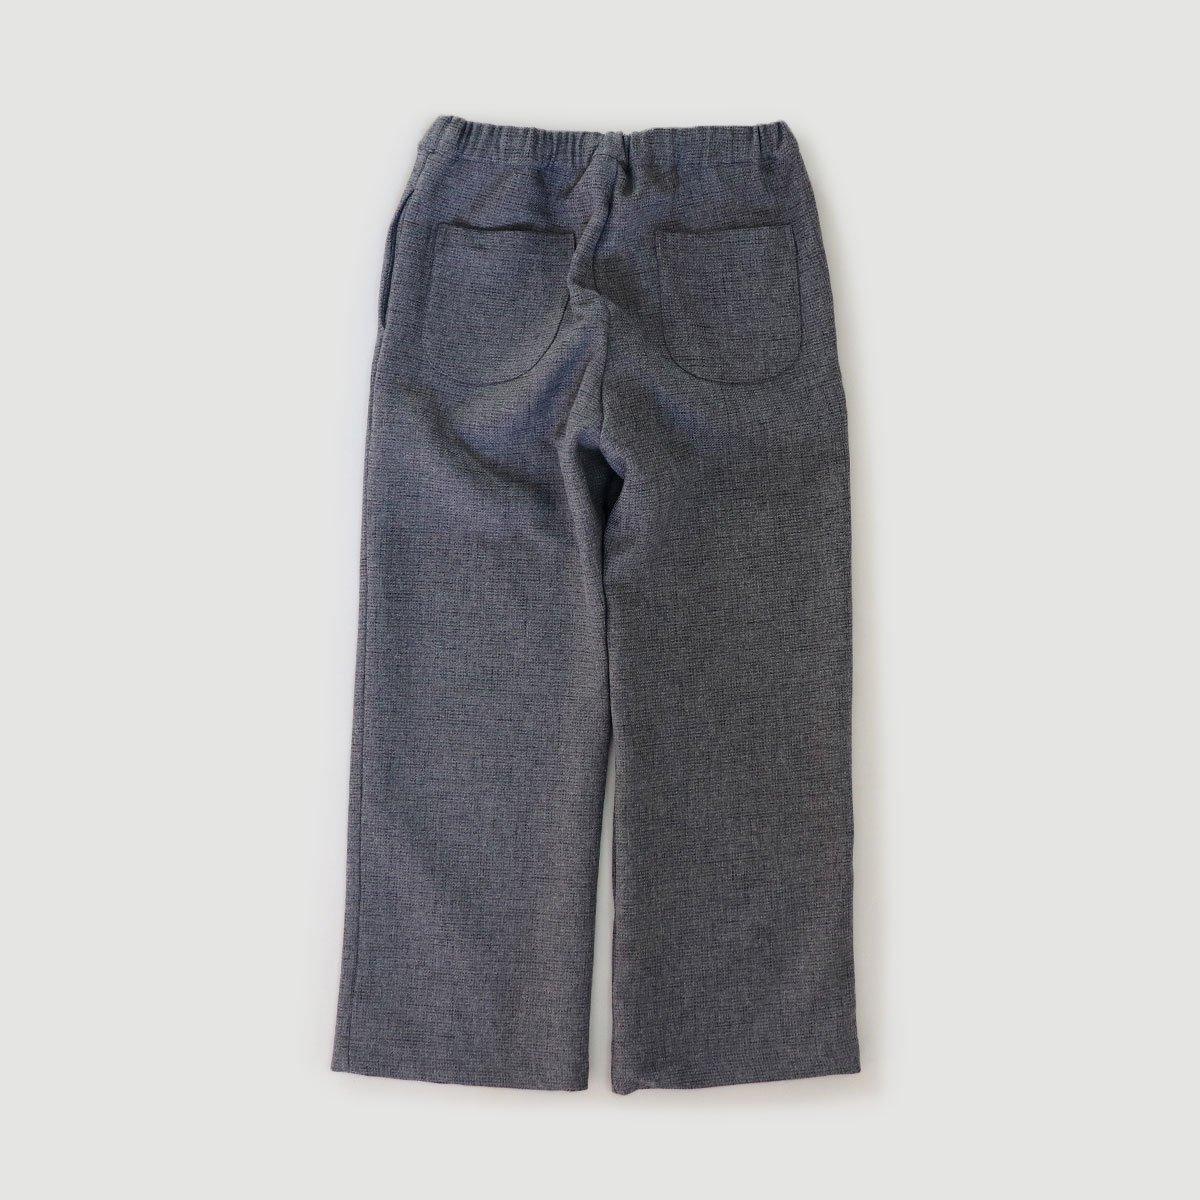 SHELL PANTS 詳細画像4